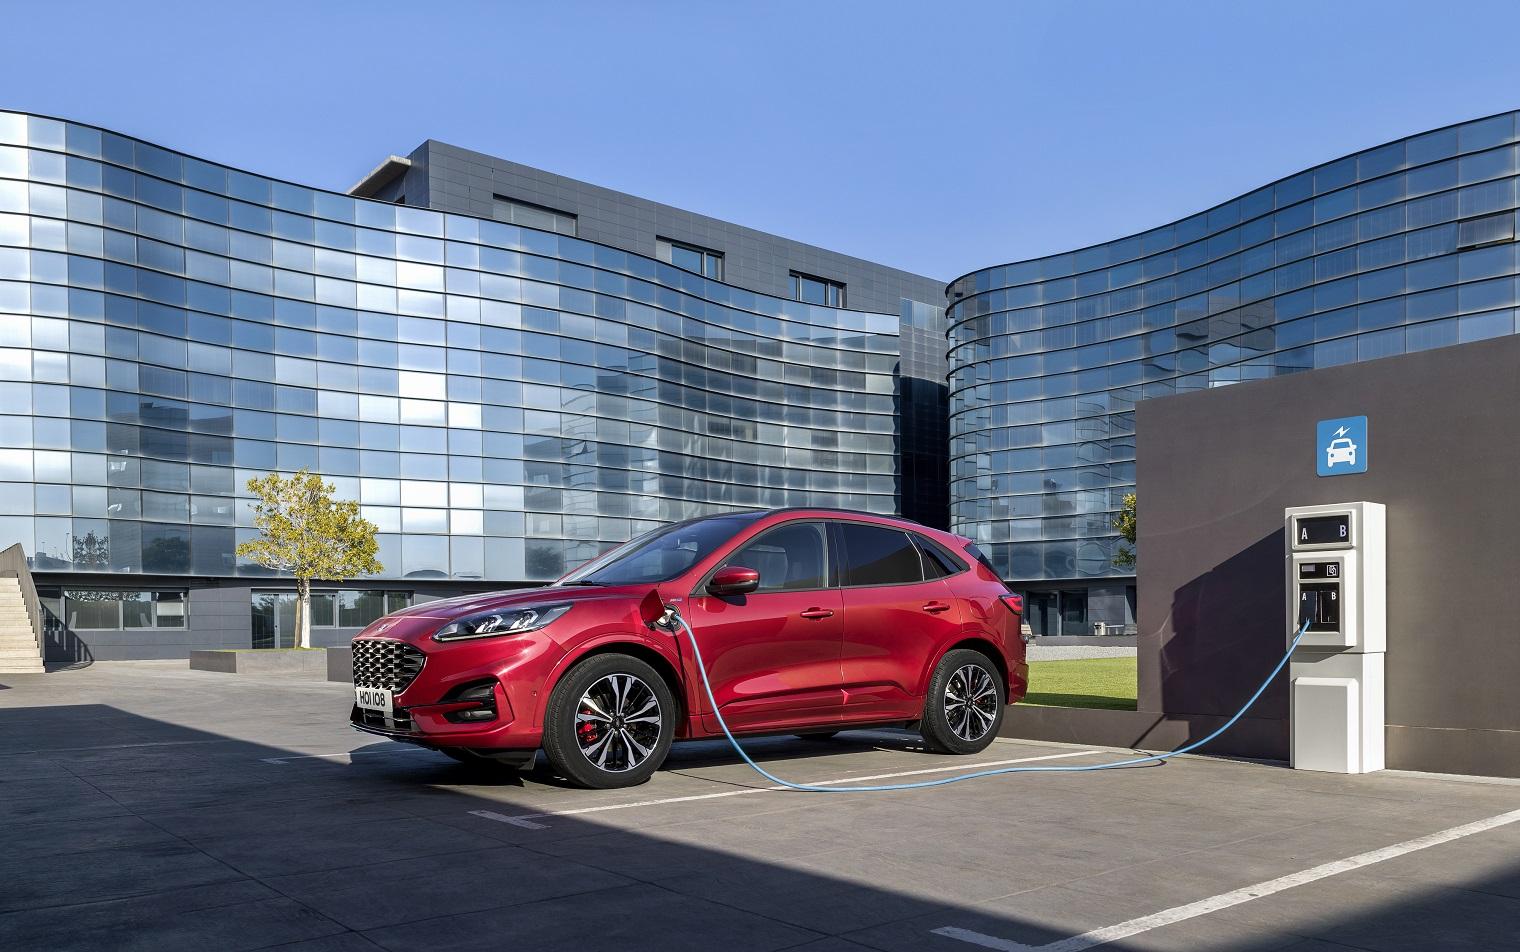 Ricarica nuova Ford Kuga plug-in hybrid